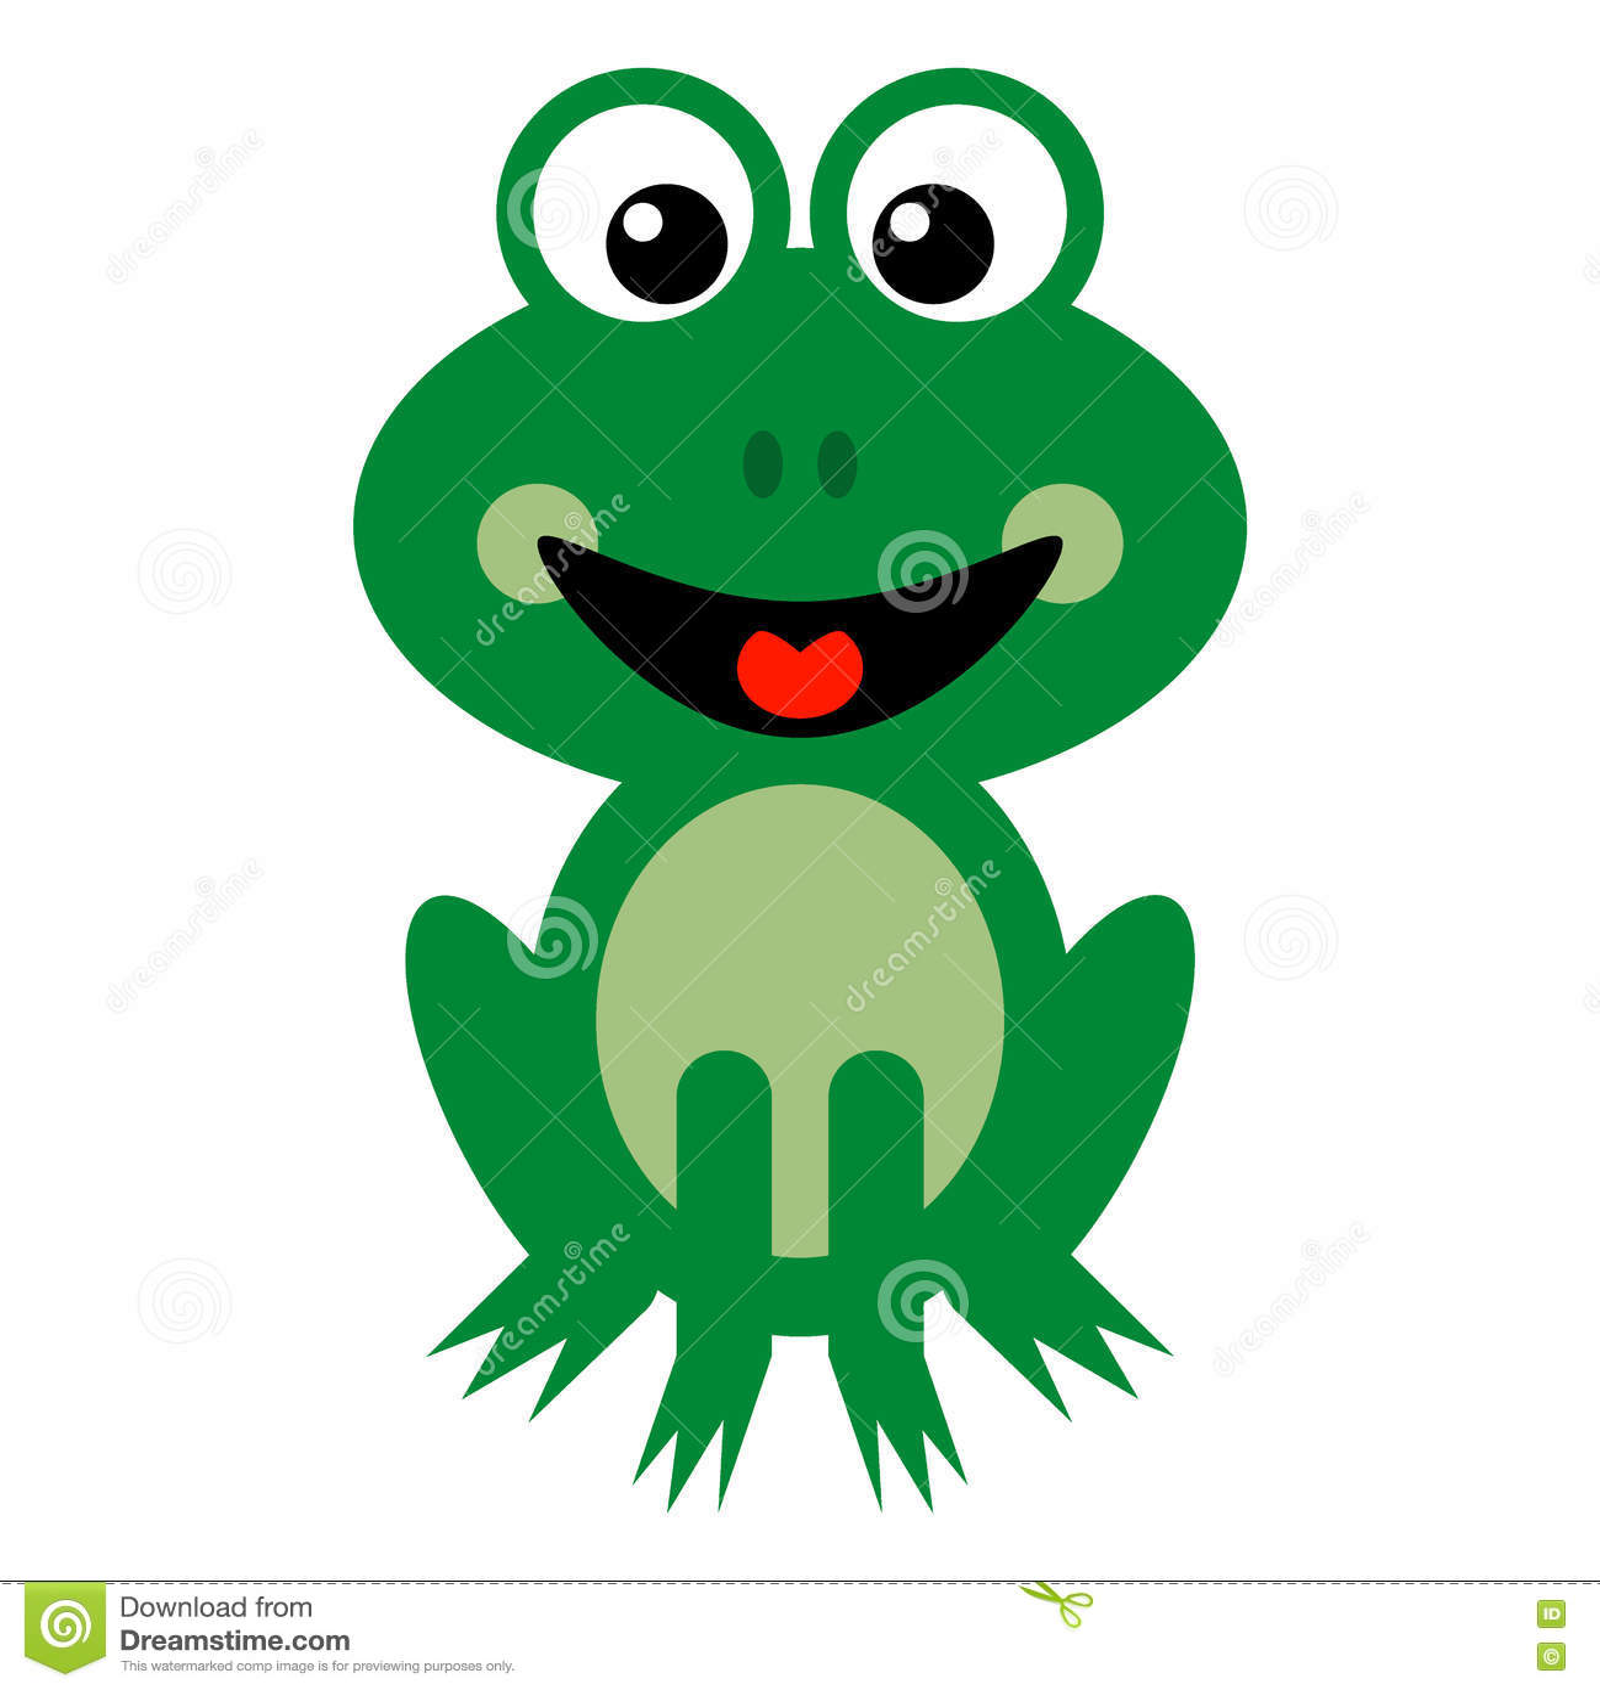 Glimlachend Groen Kikkerbeeldverhaal